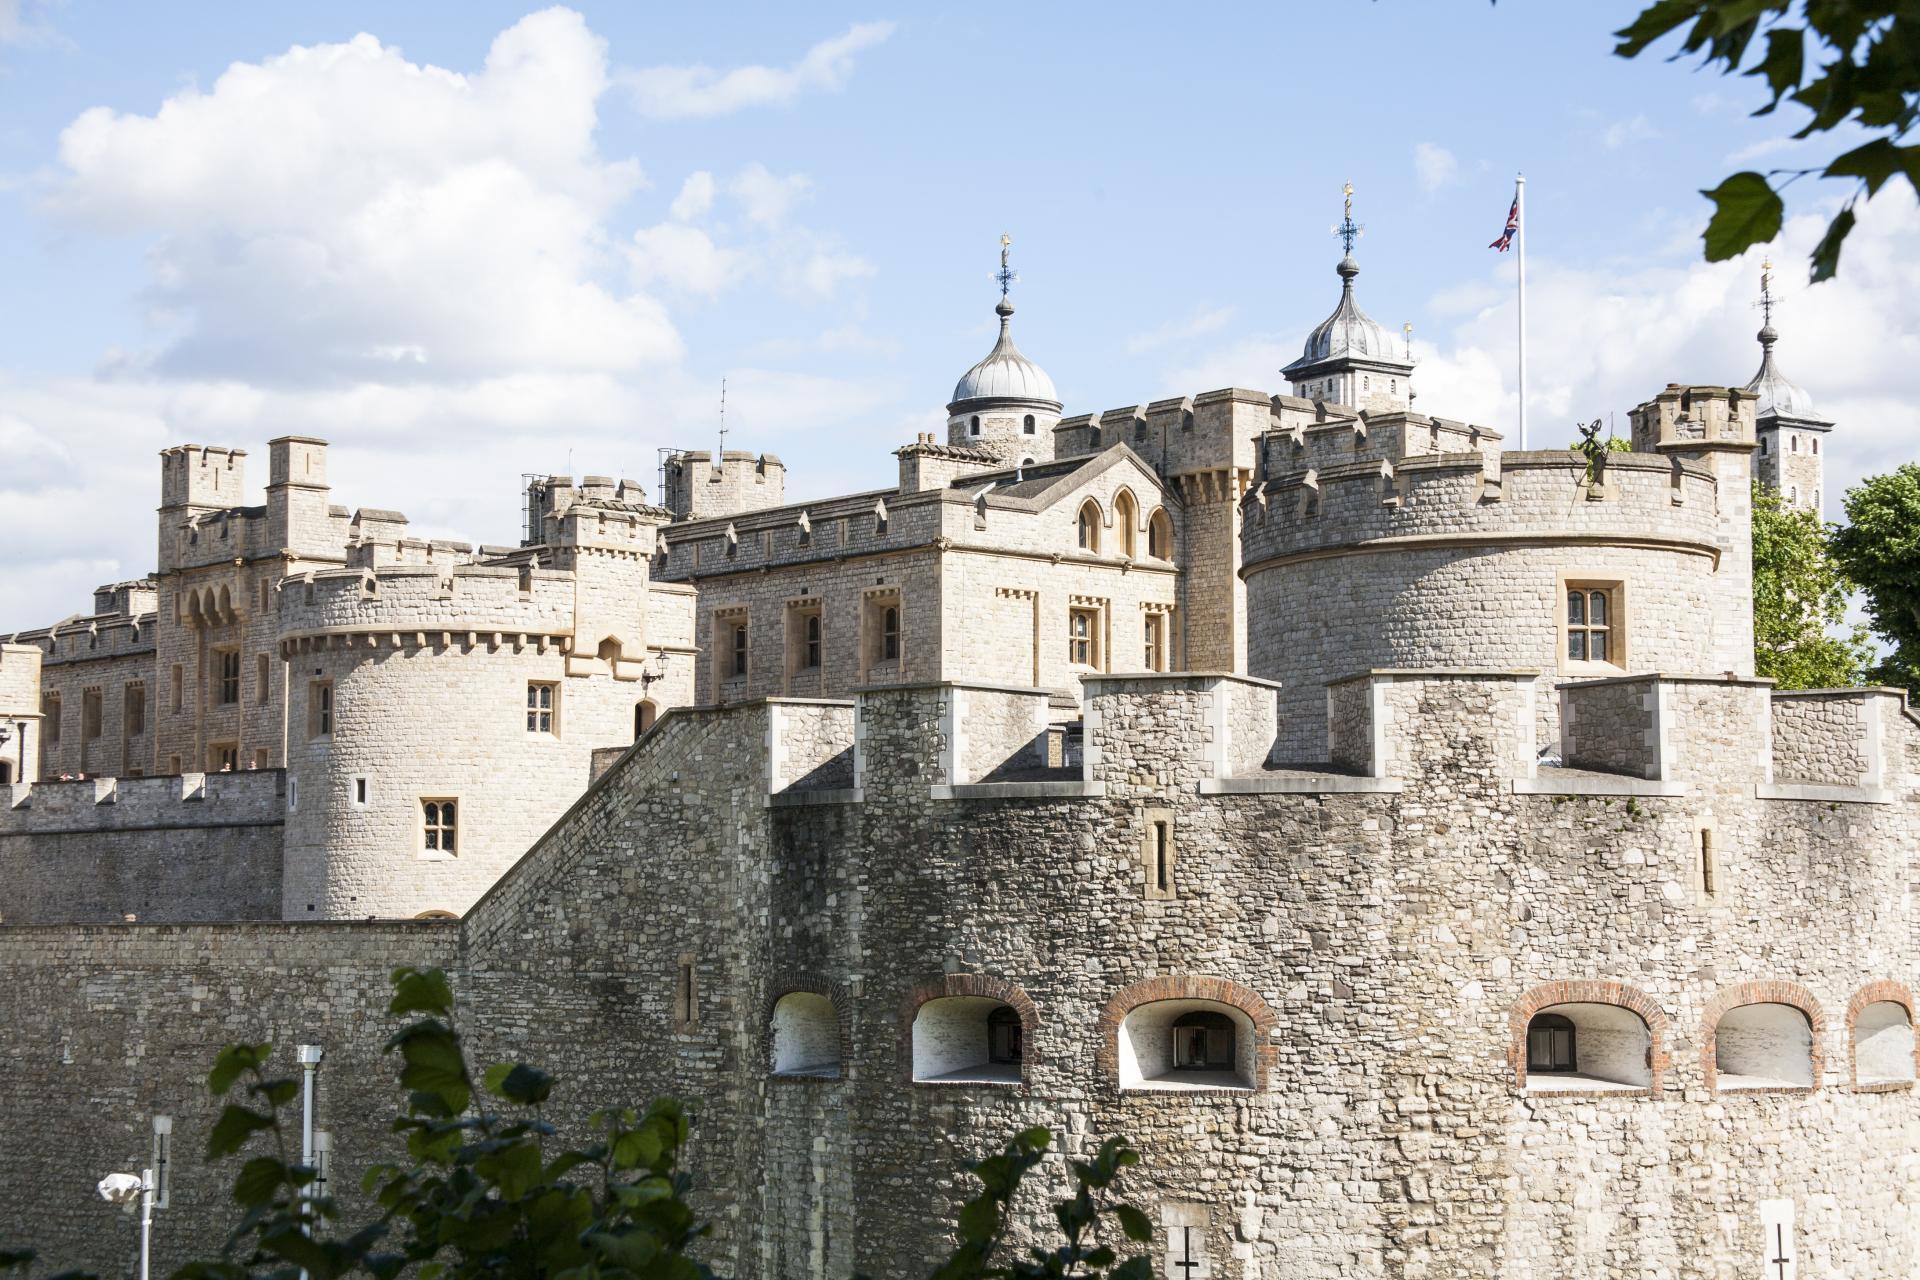 Castillo de Londres: Tower of London